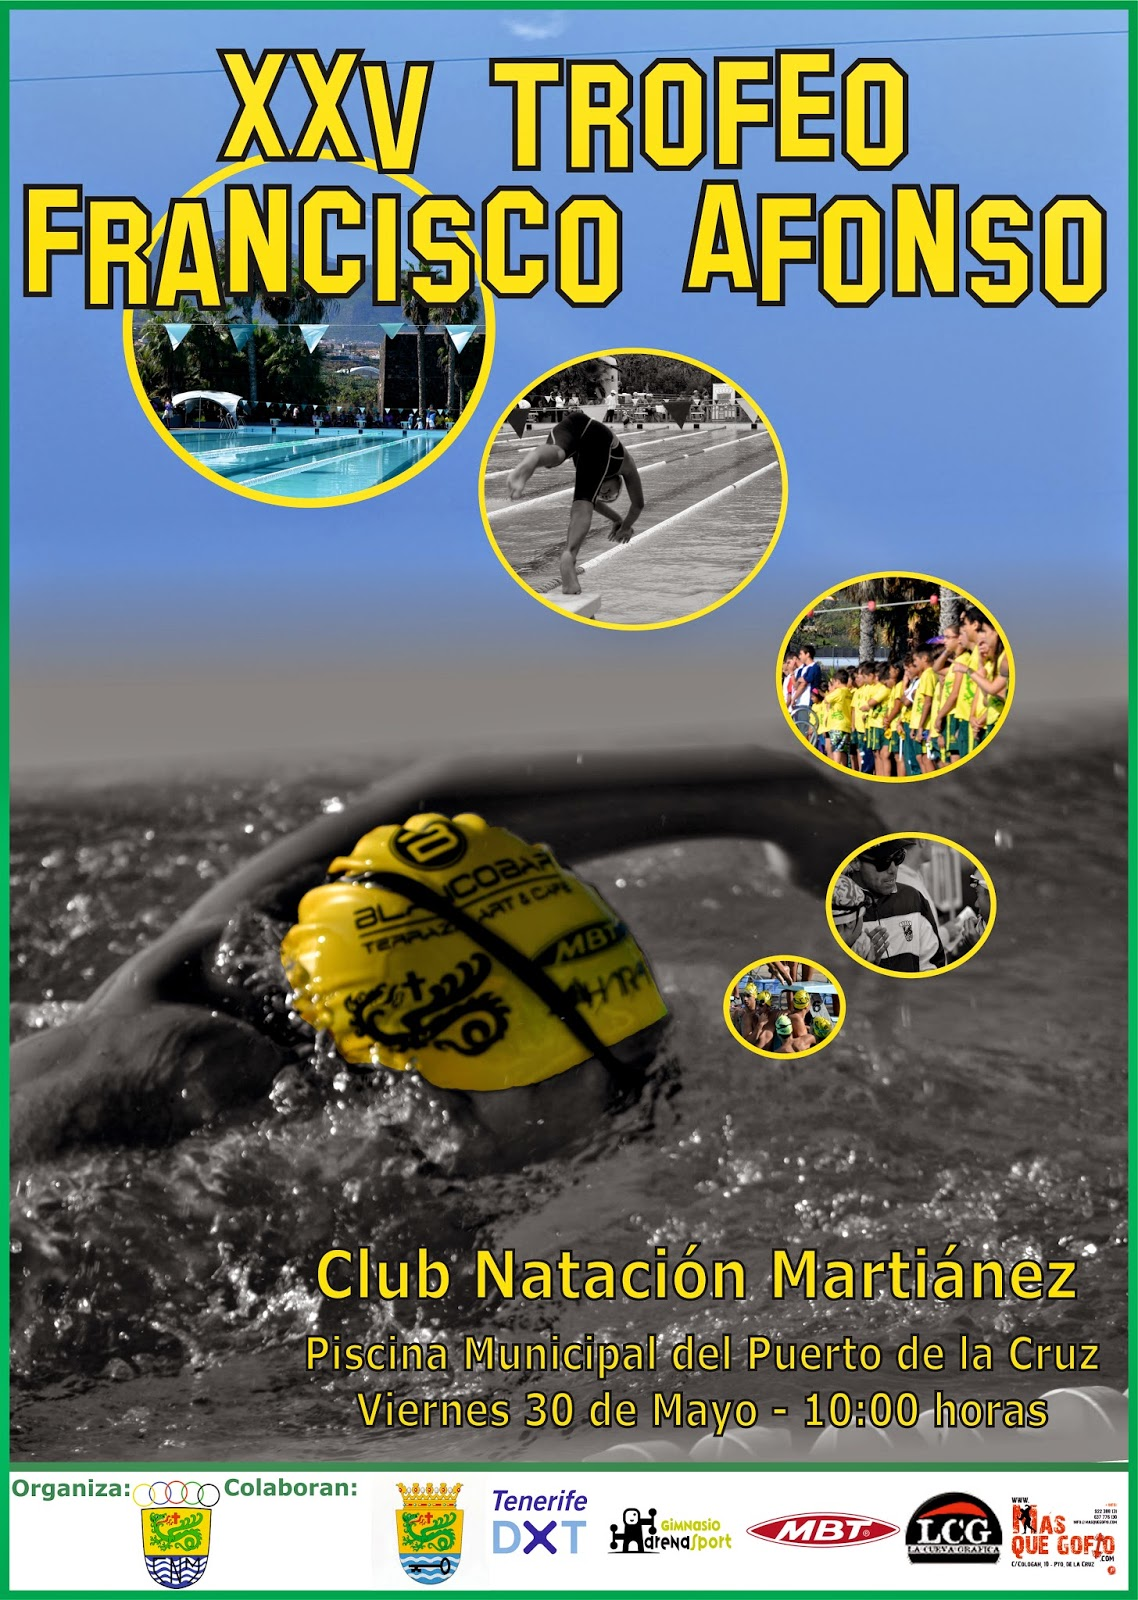 Ntc natacion canaria mayo 2014 for Piscina municipal puerto de la cruz